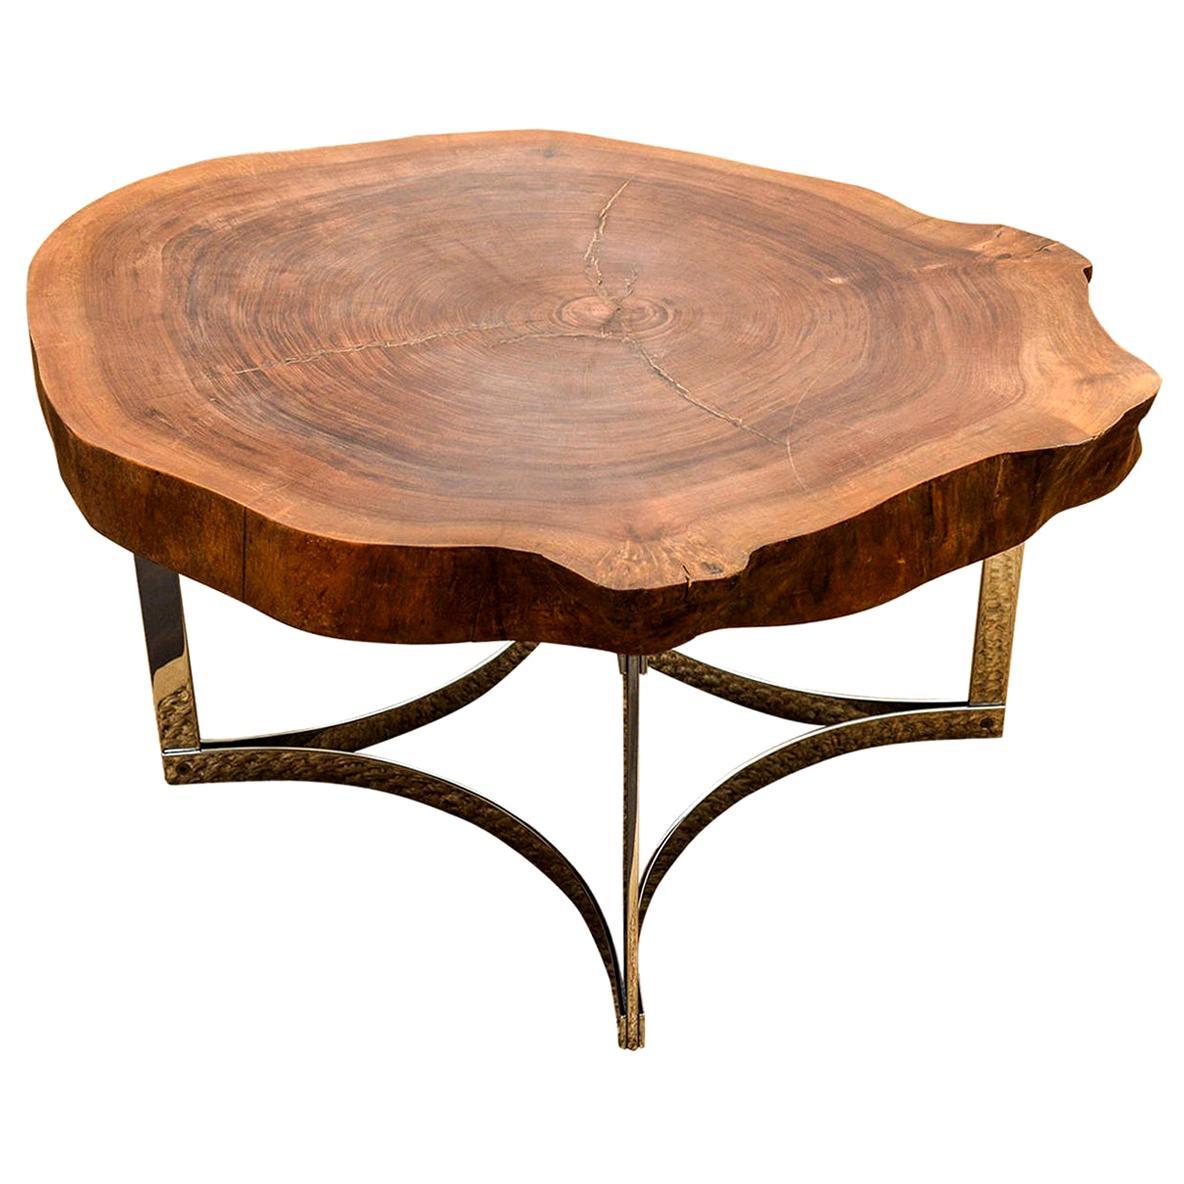 live edge wood slab coffee table on a modernist chrome base by jean hubeaux